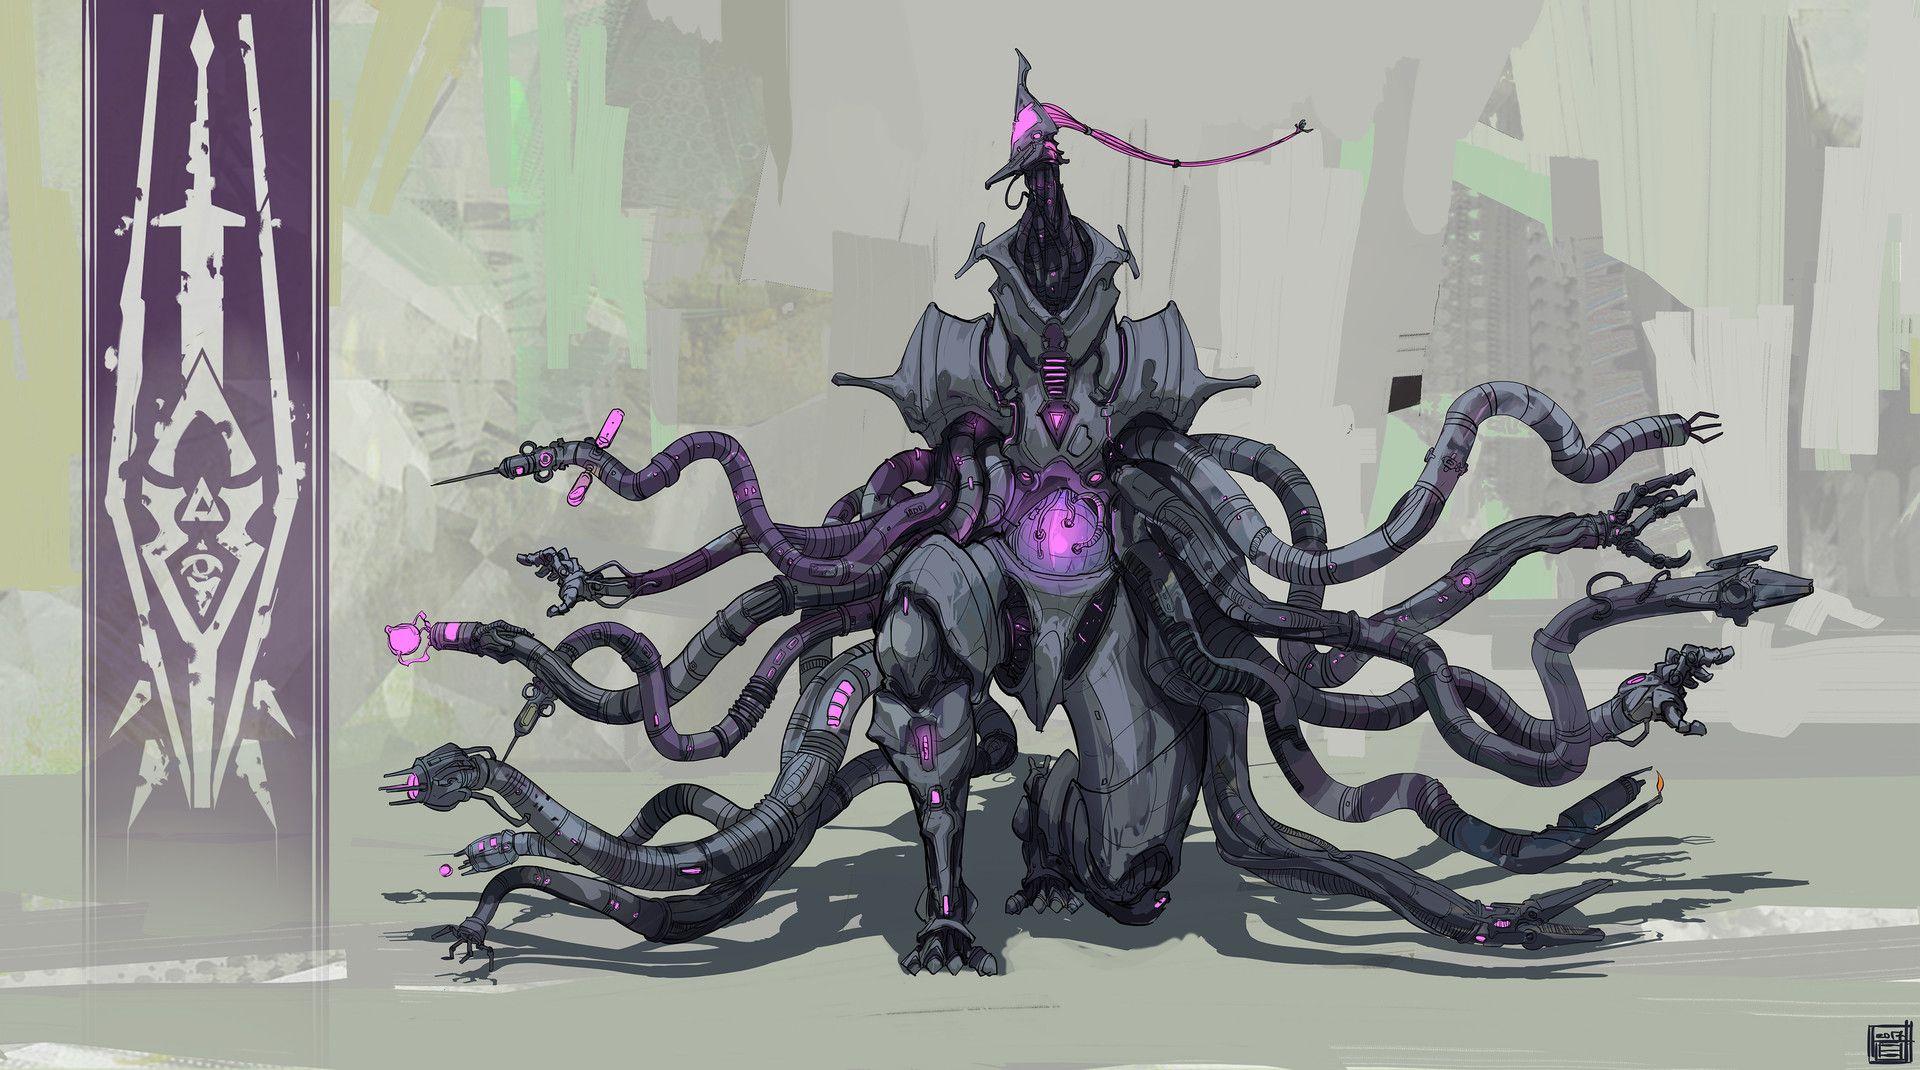 ArtStation - Character Design Challenge - Beyond Human Villains, Hue Teo